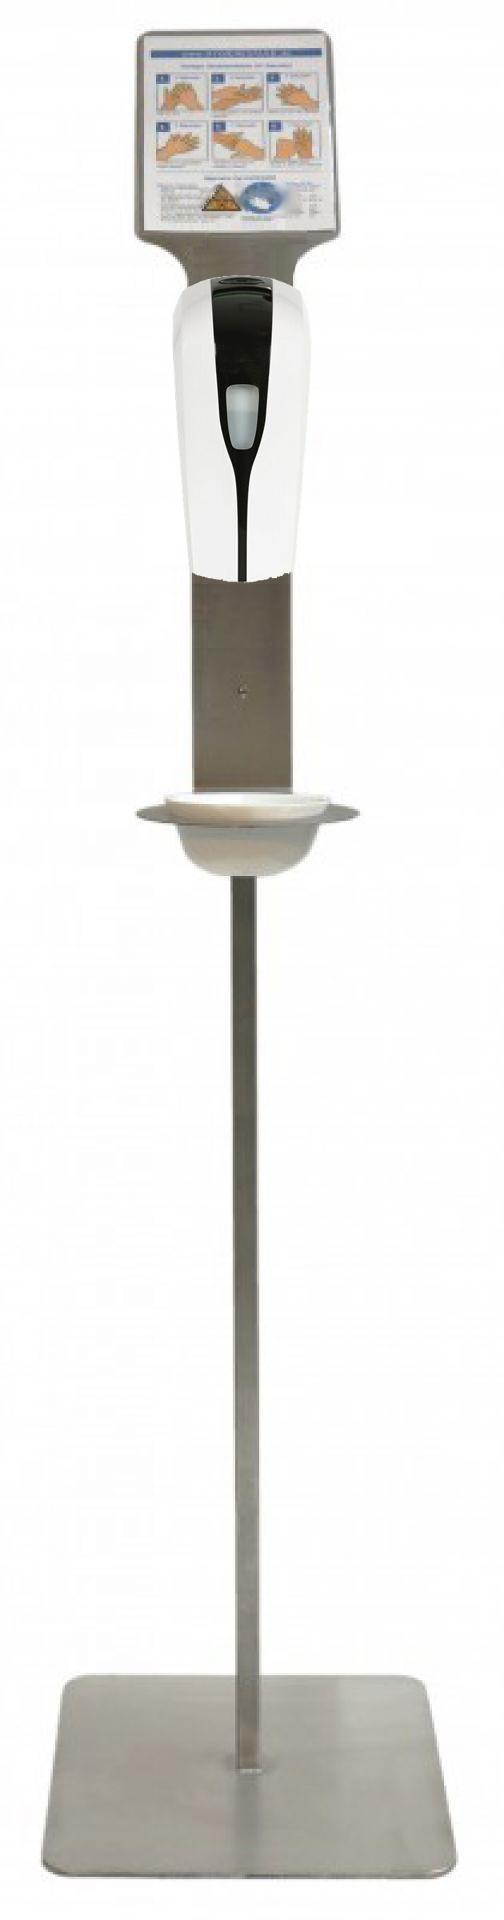 Hygienesäule - Automatik (Markenlos)